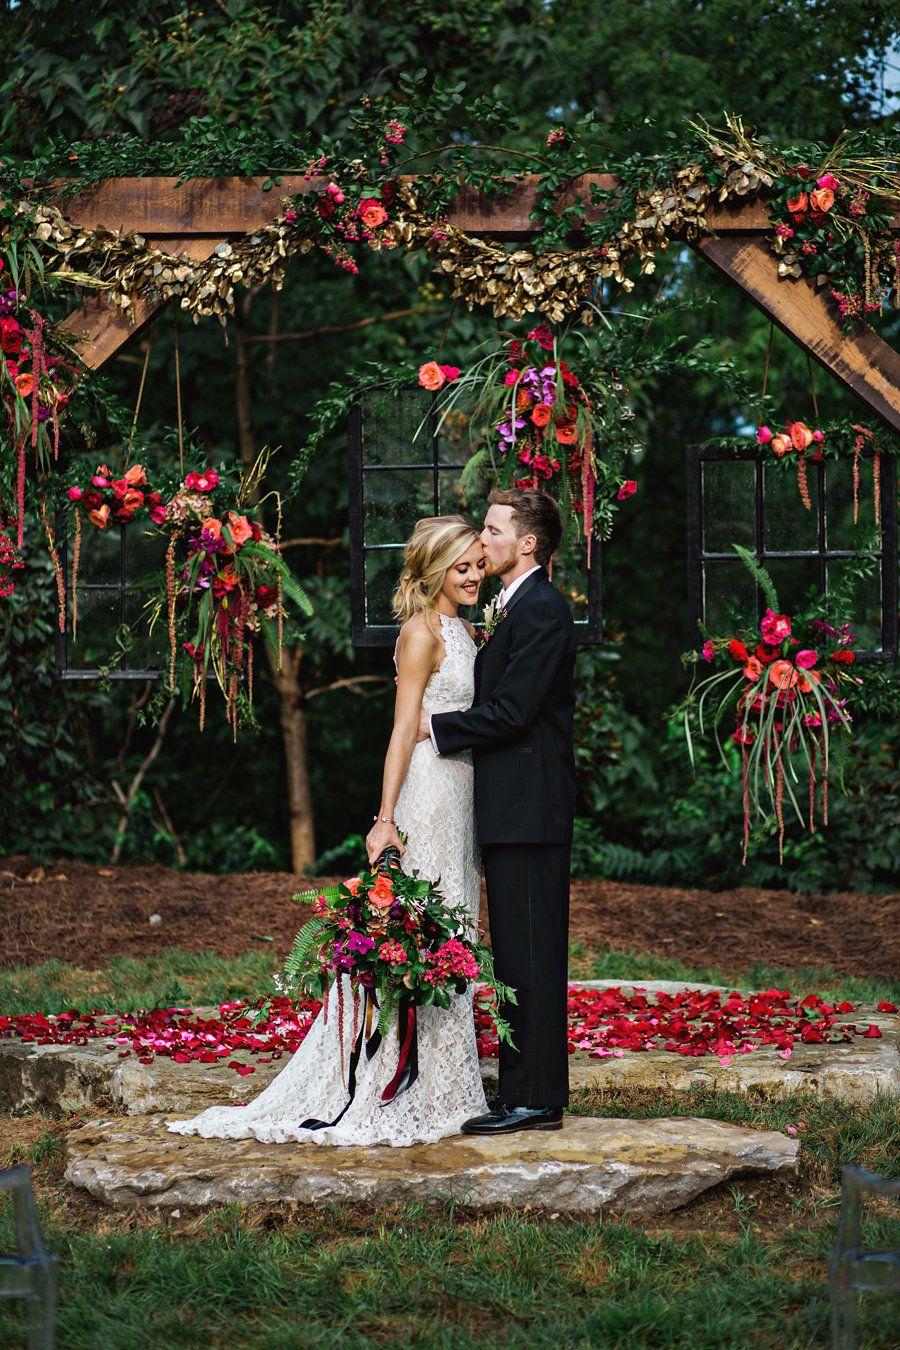 cheery bohemian wedding inspiration at a rock quarry boho wedding